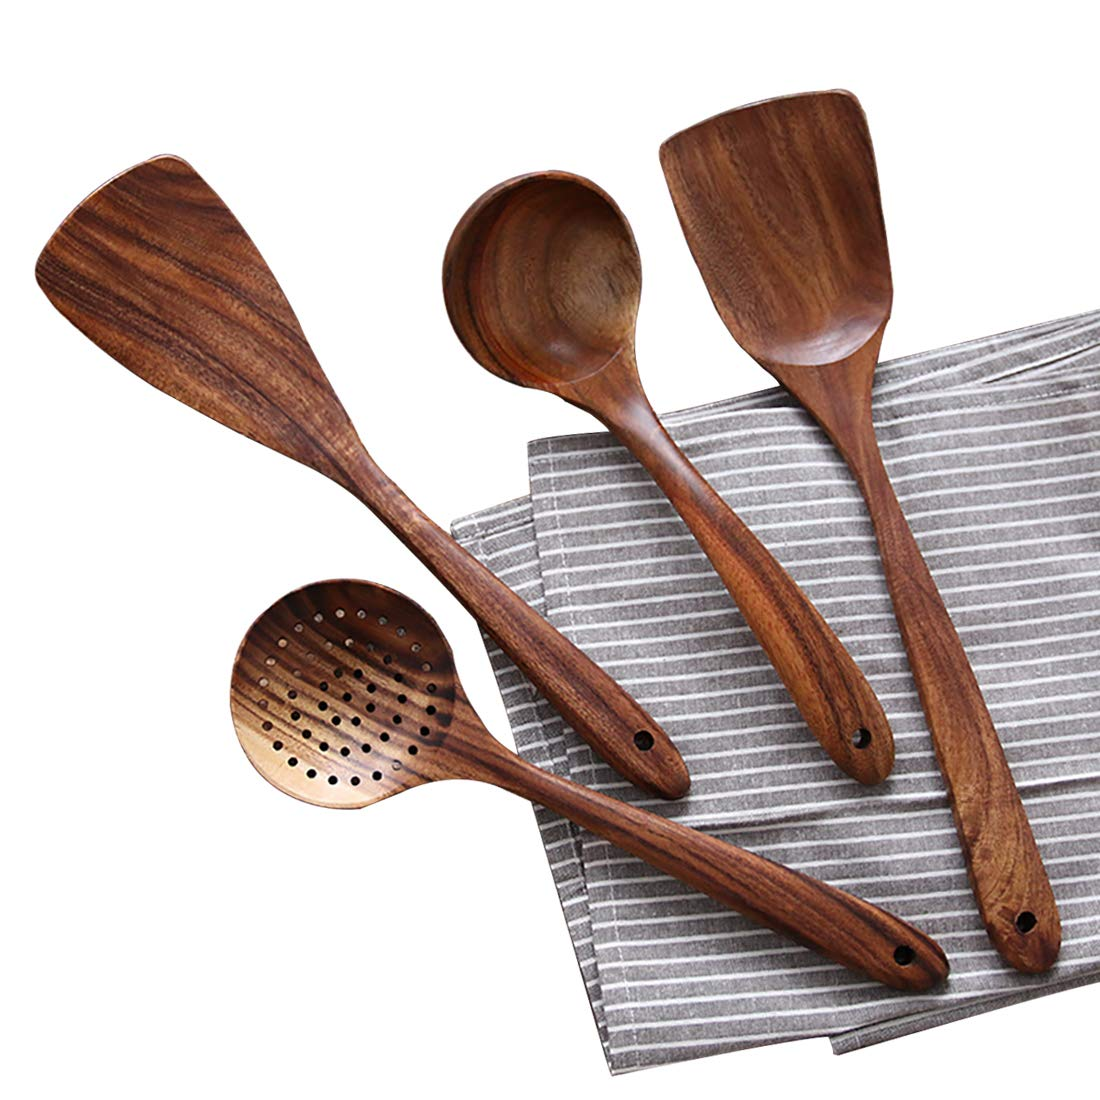 Wooden Spons.jpg